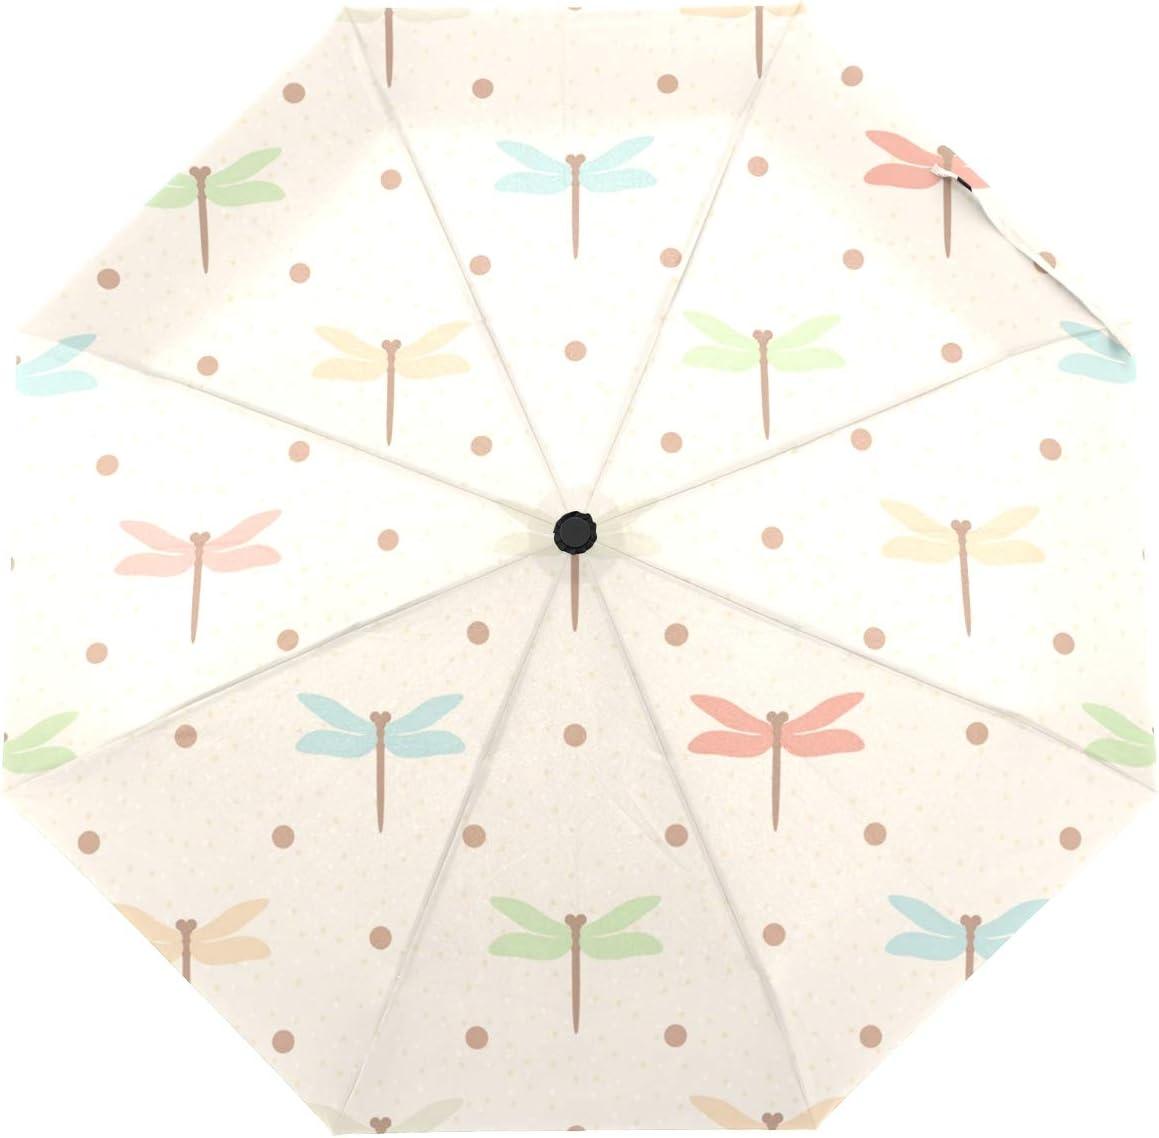 OREZI Automatic Open Max 75% OFF Challenge the lowest price Close Folding Umbrella Dragonflies An Color